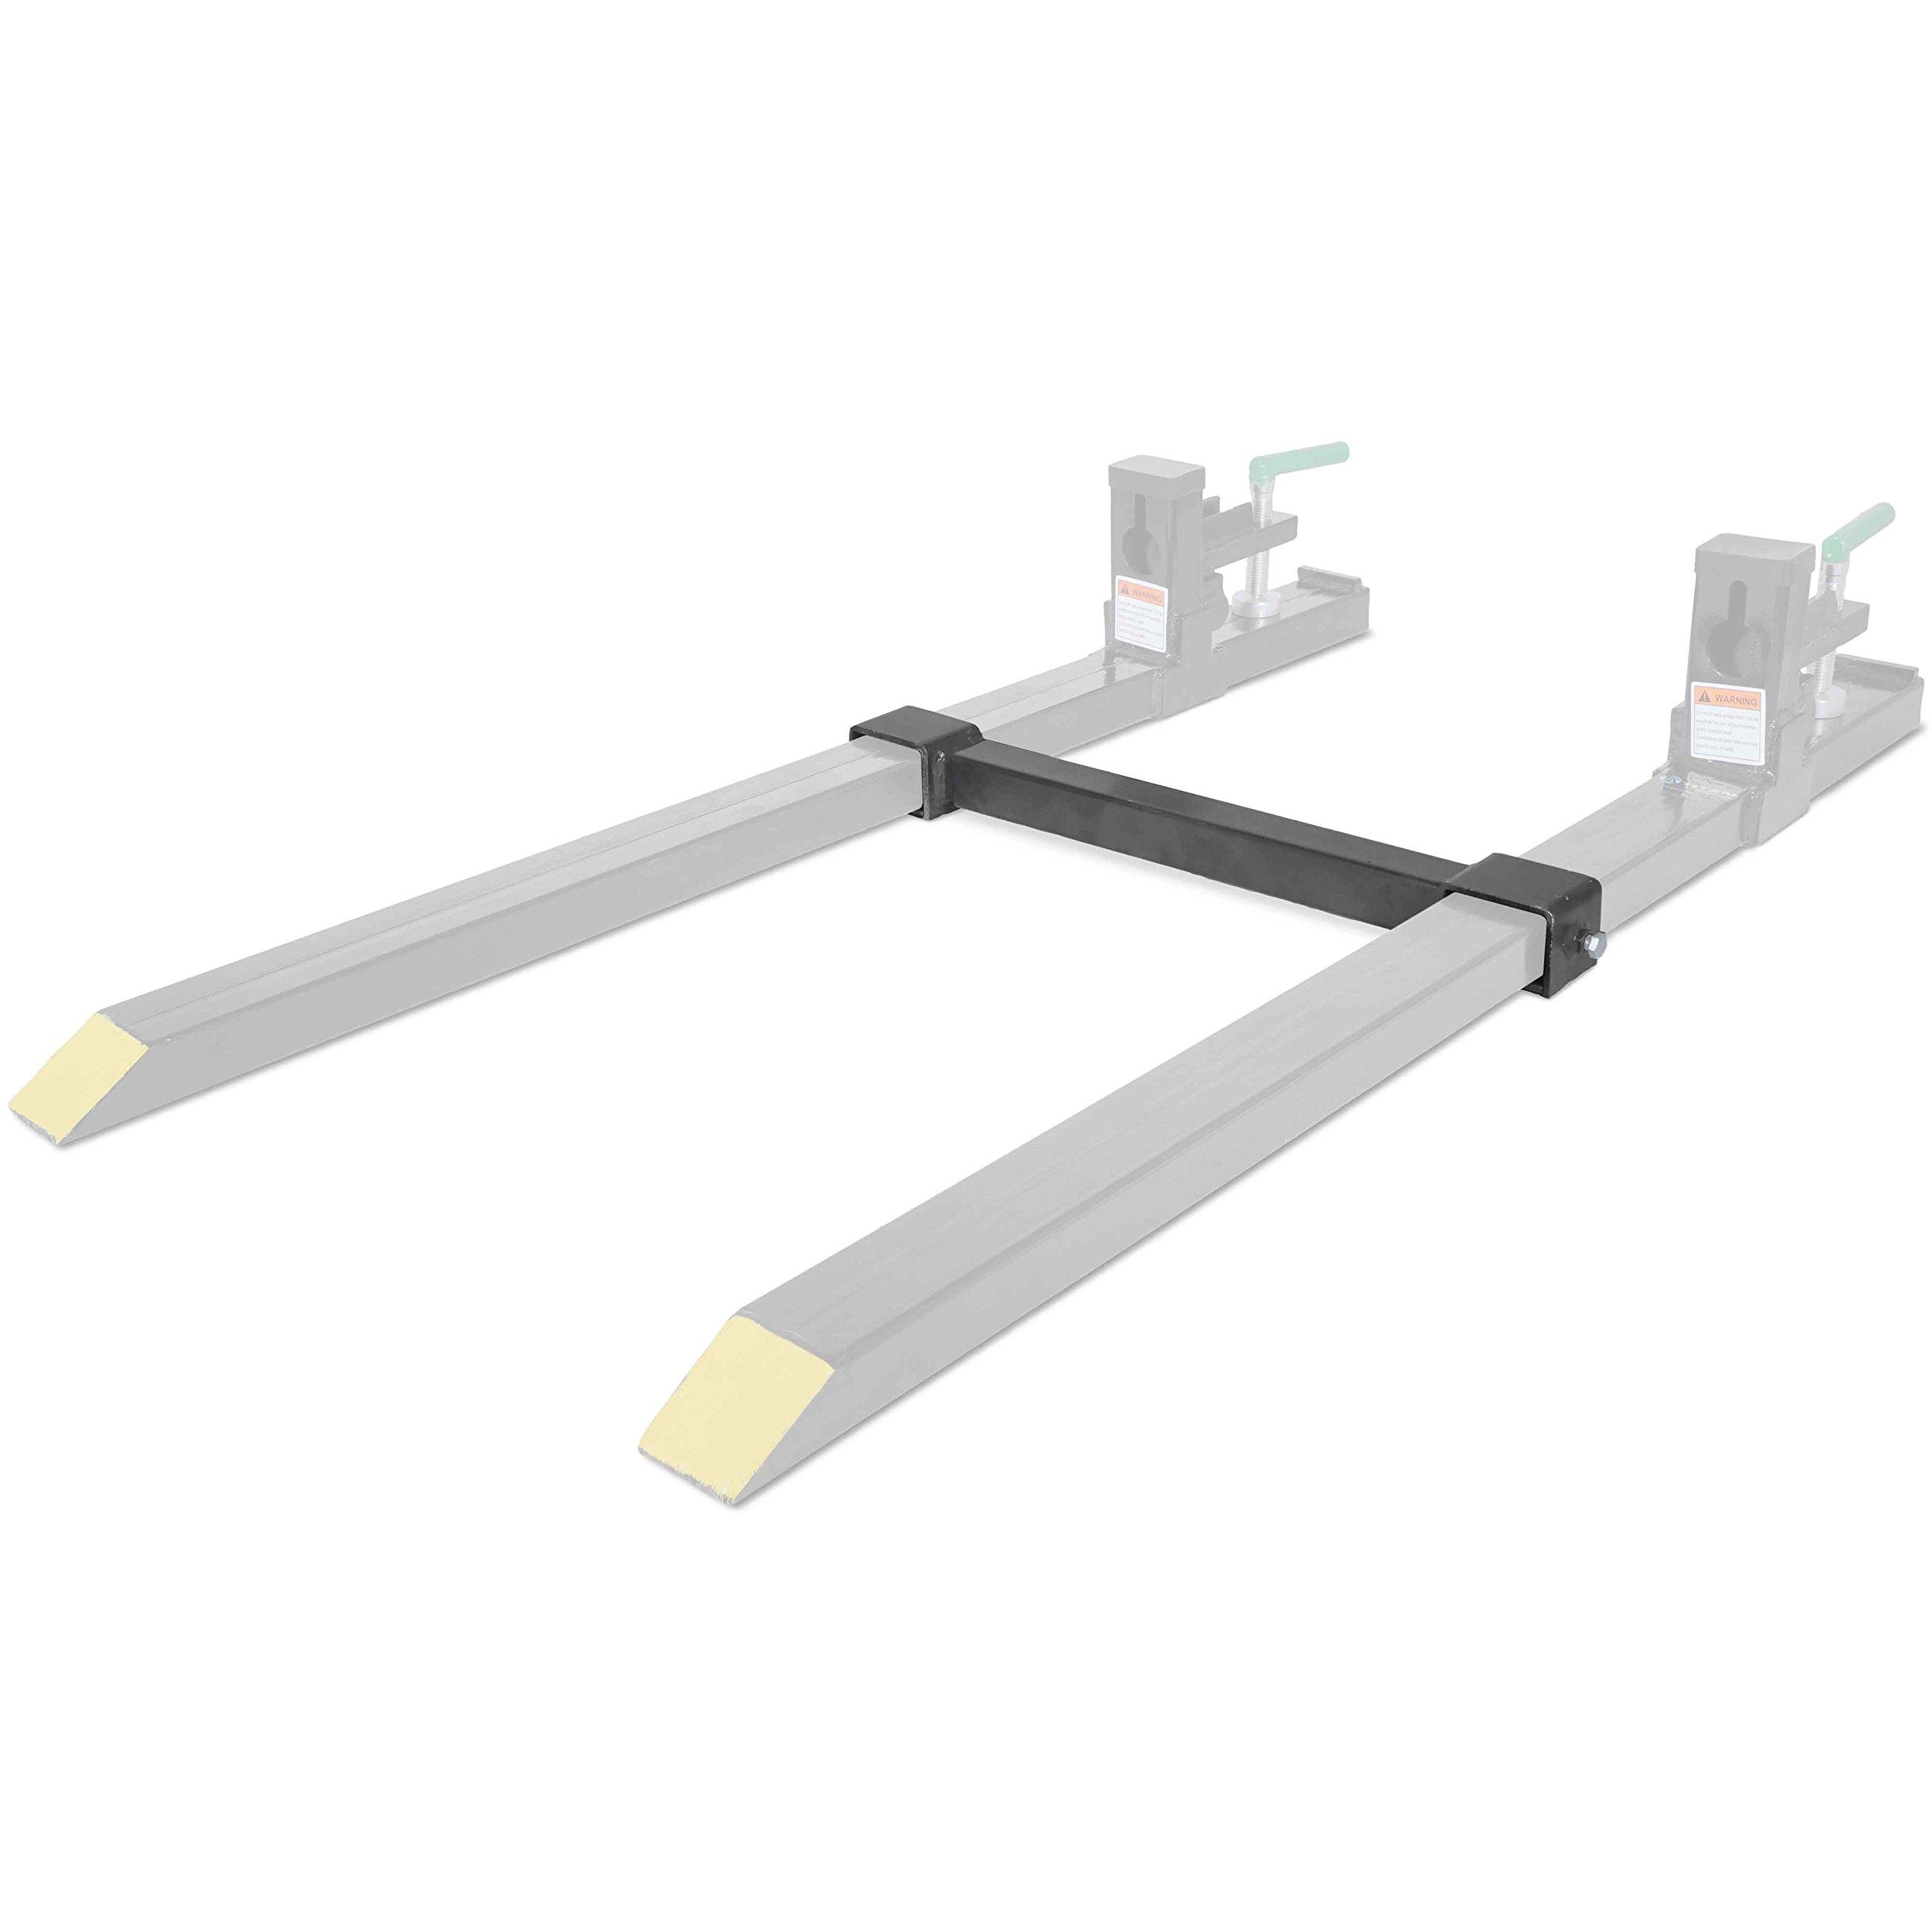 Titan Attachments Clamp on Fork Stabilizer Bar for Medium Duty Forks